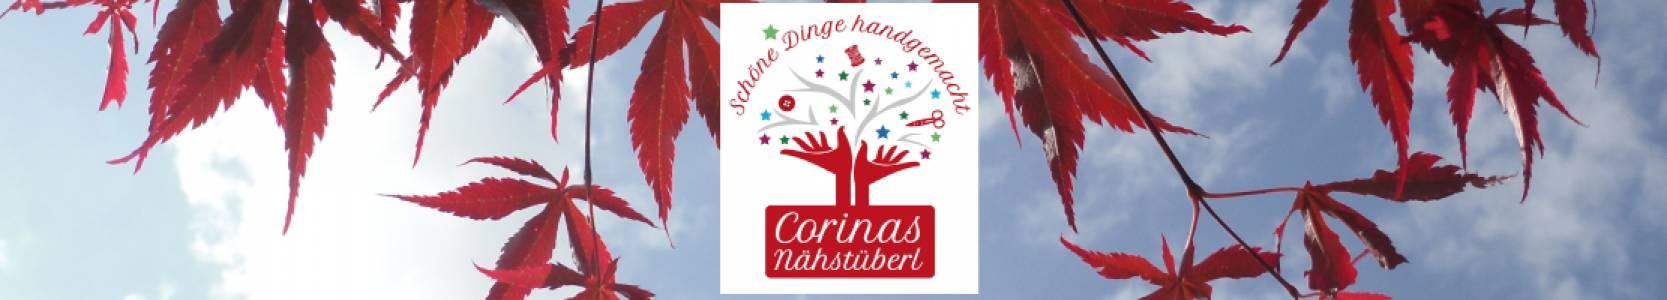 Corinas Nähstüberl auf kasuwa.de